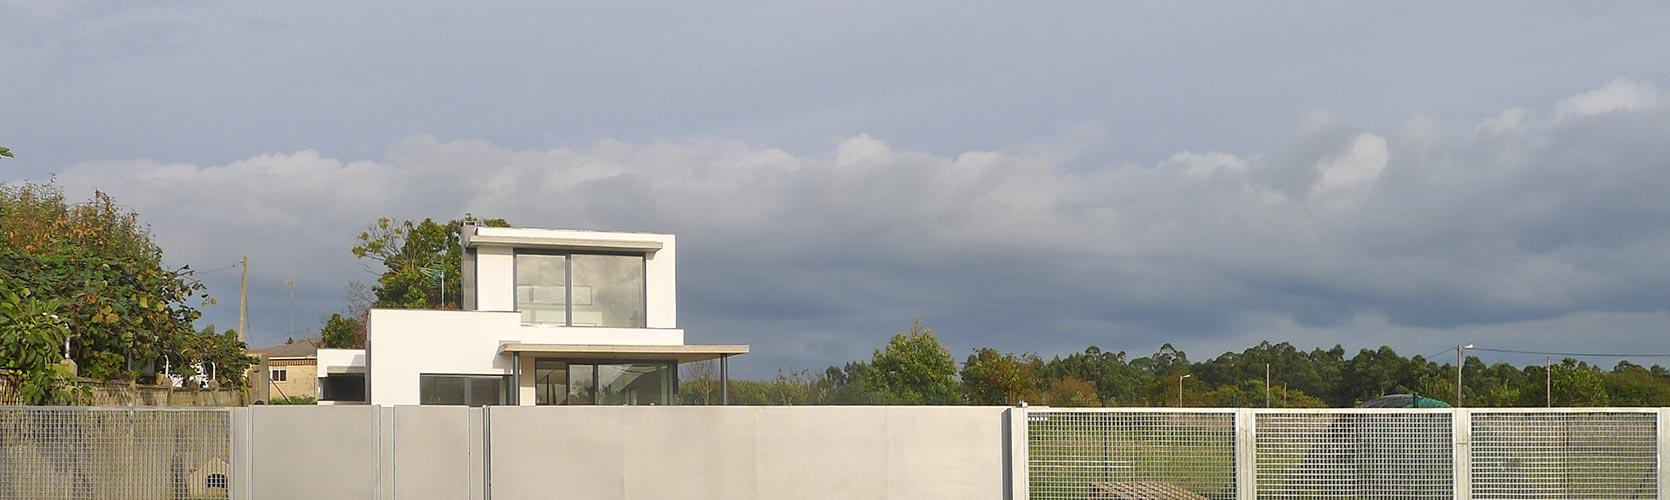 Ad Arquitectura Estudio De Arquitectura En A Coru A Estudios Arquitectura  Coruna